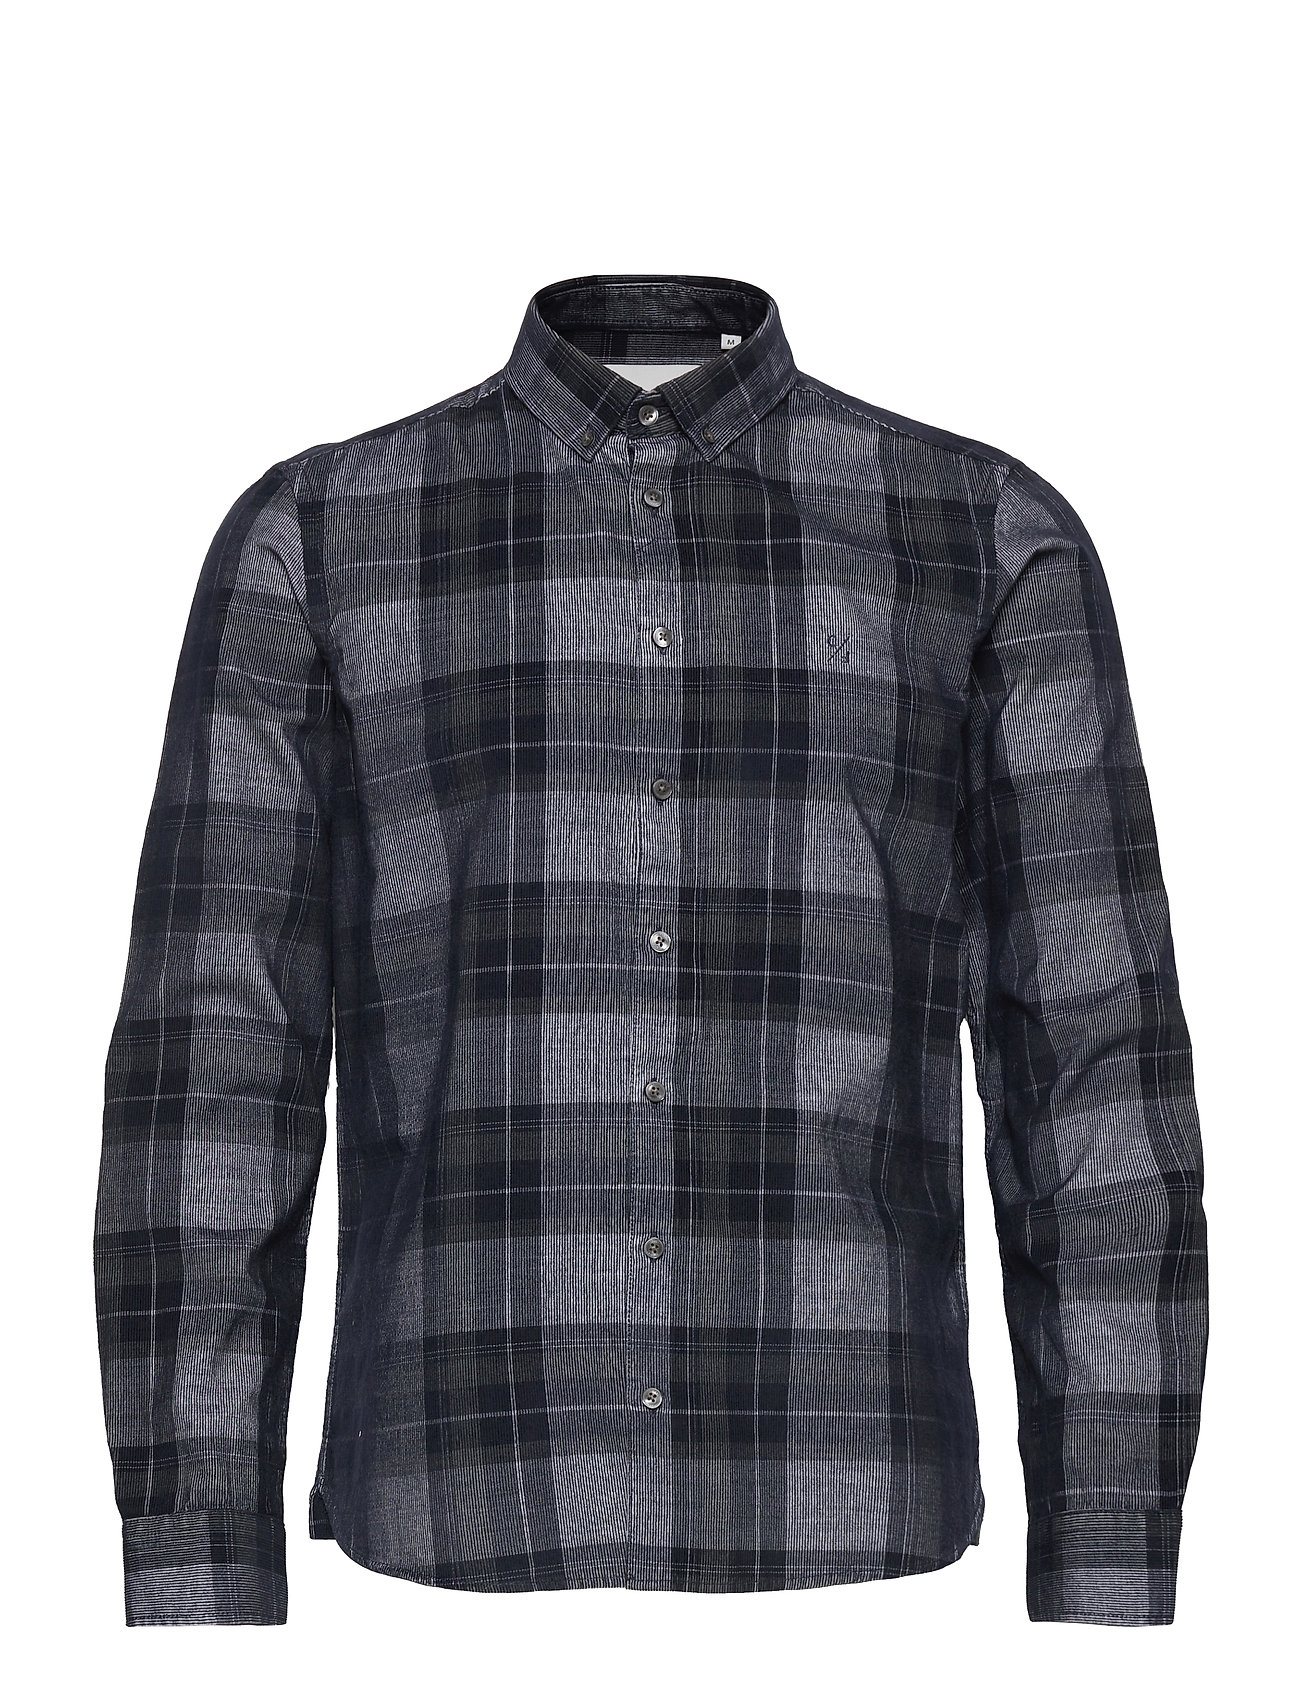 Image of Arthur Bd Ls Shirt Skjorte Casual Blå Casual Friday (3461042797)